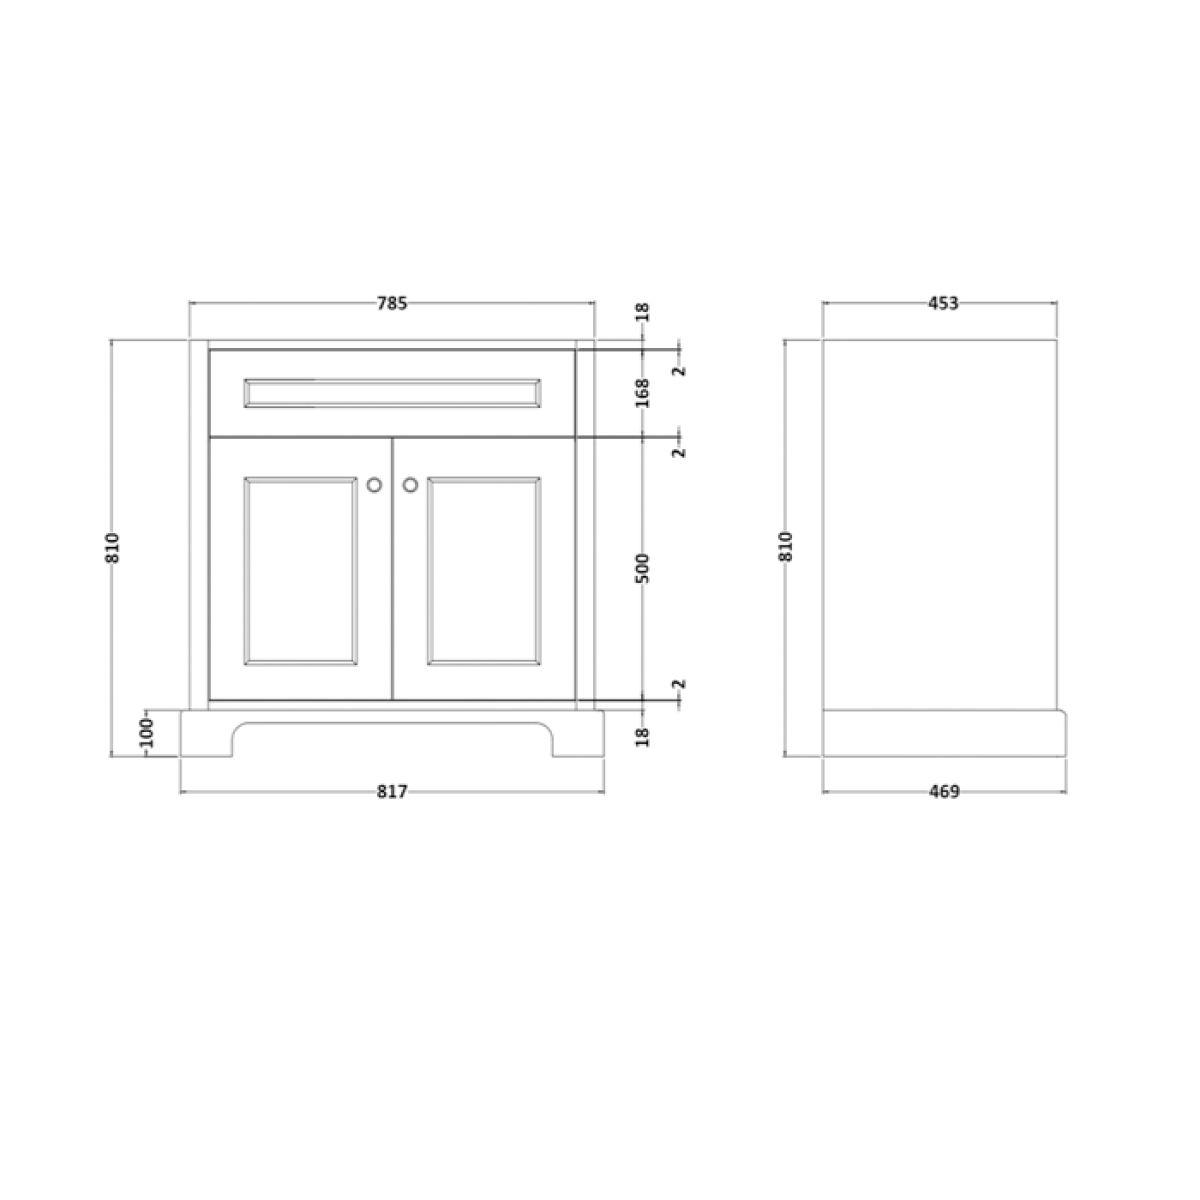 RAK Washington White Vanity Unit with Black Countertop 800mm Measurements